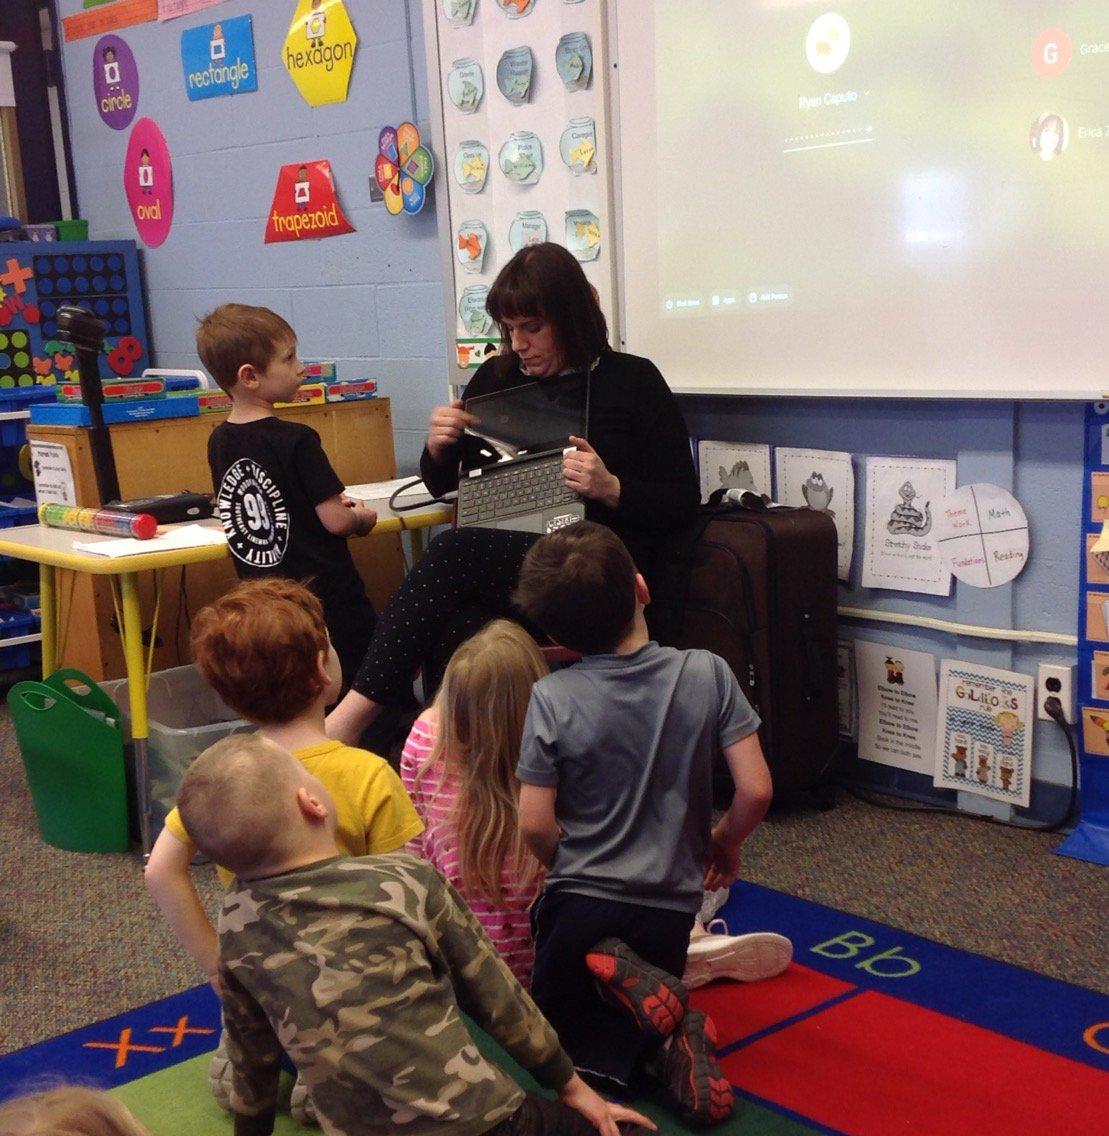 Chromebooks in Kindergarten #grcsu <br>http://pic.twitter.com/qed9IslBbl